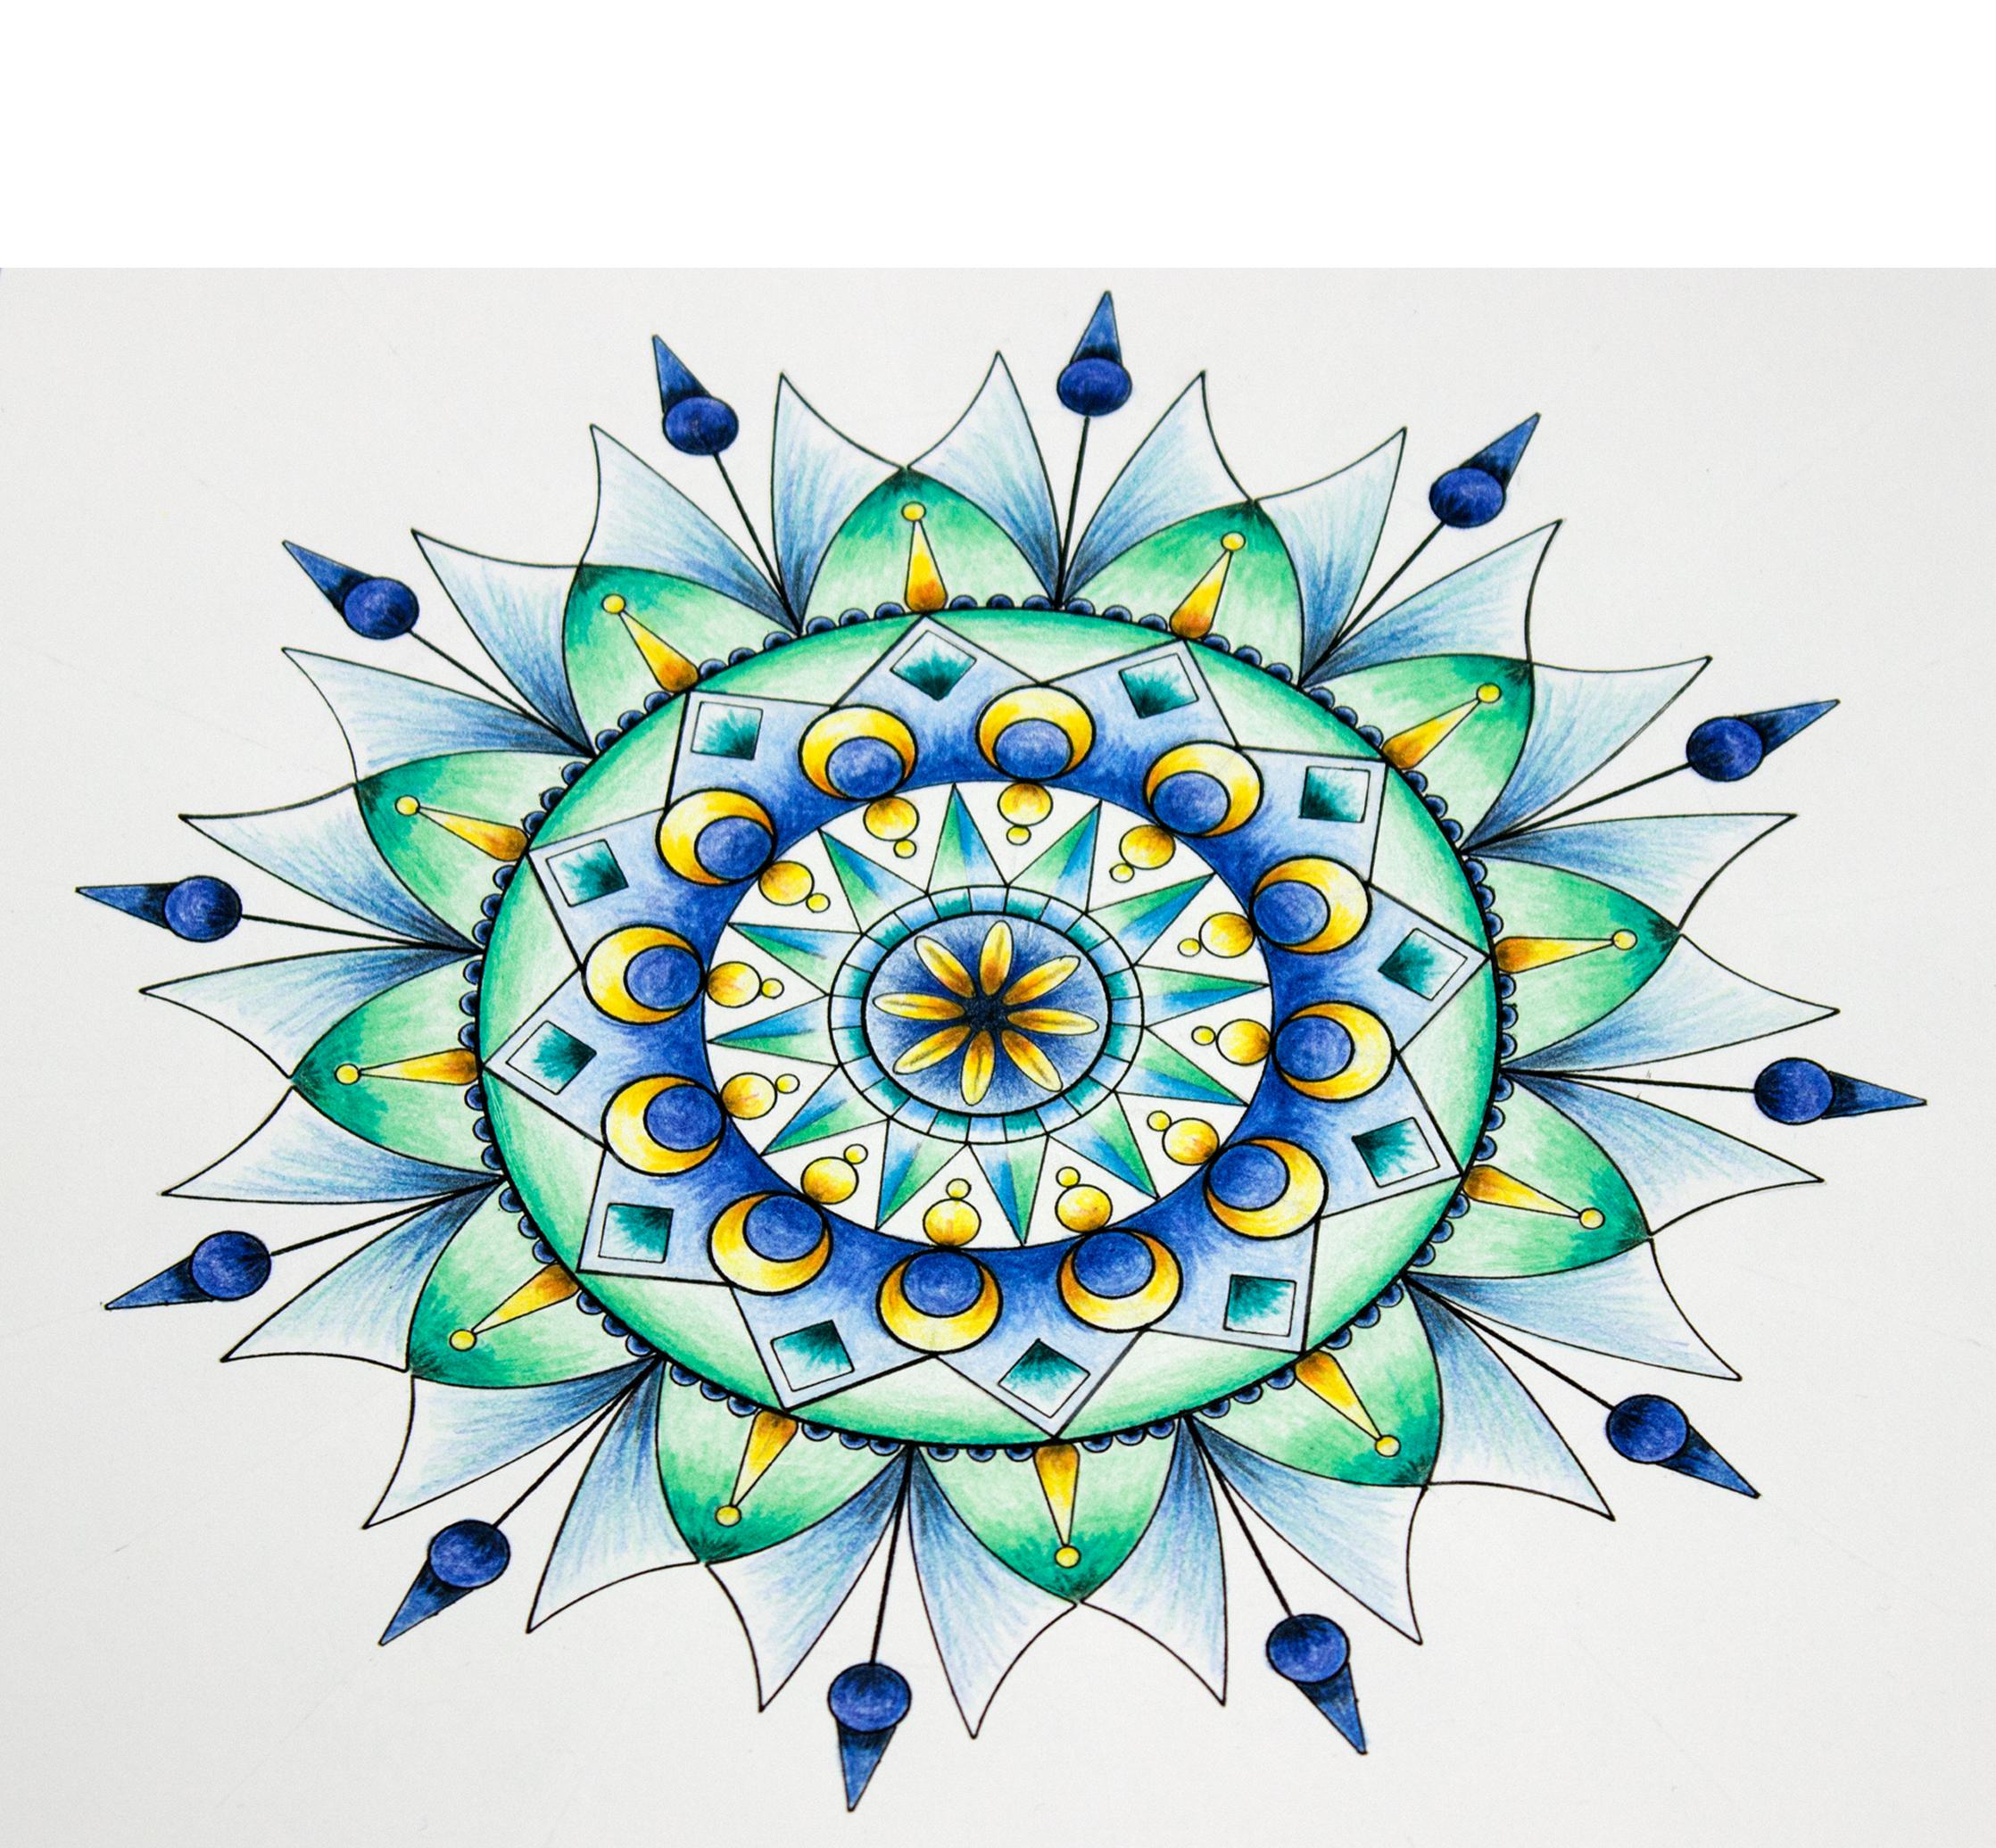 mandaladesigncolor.jpg